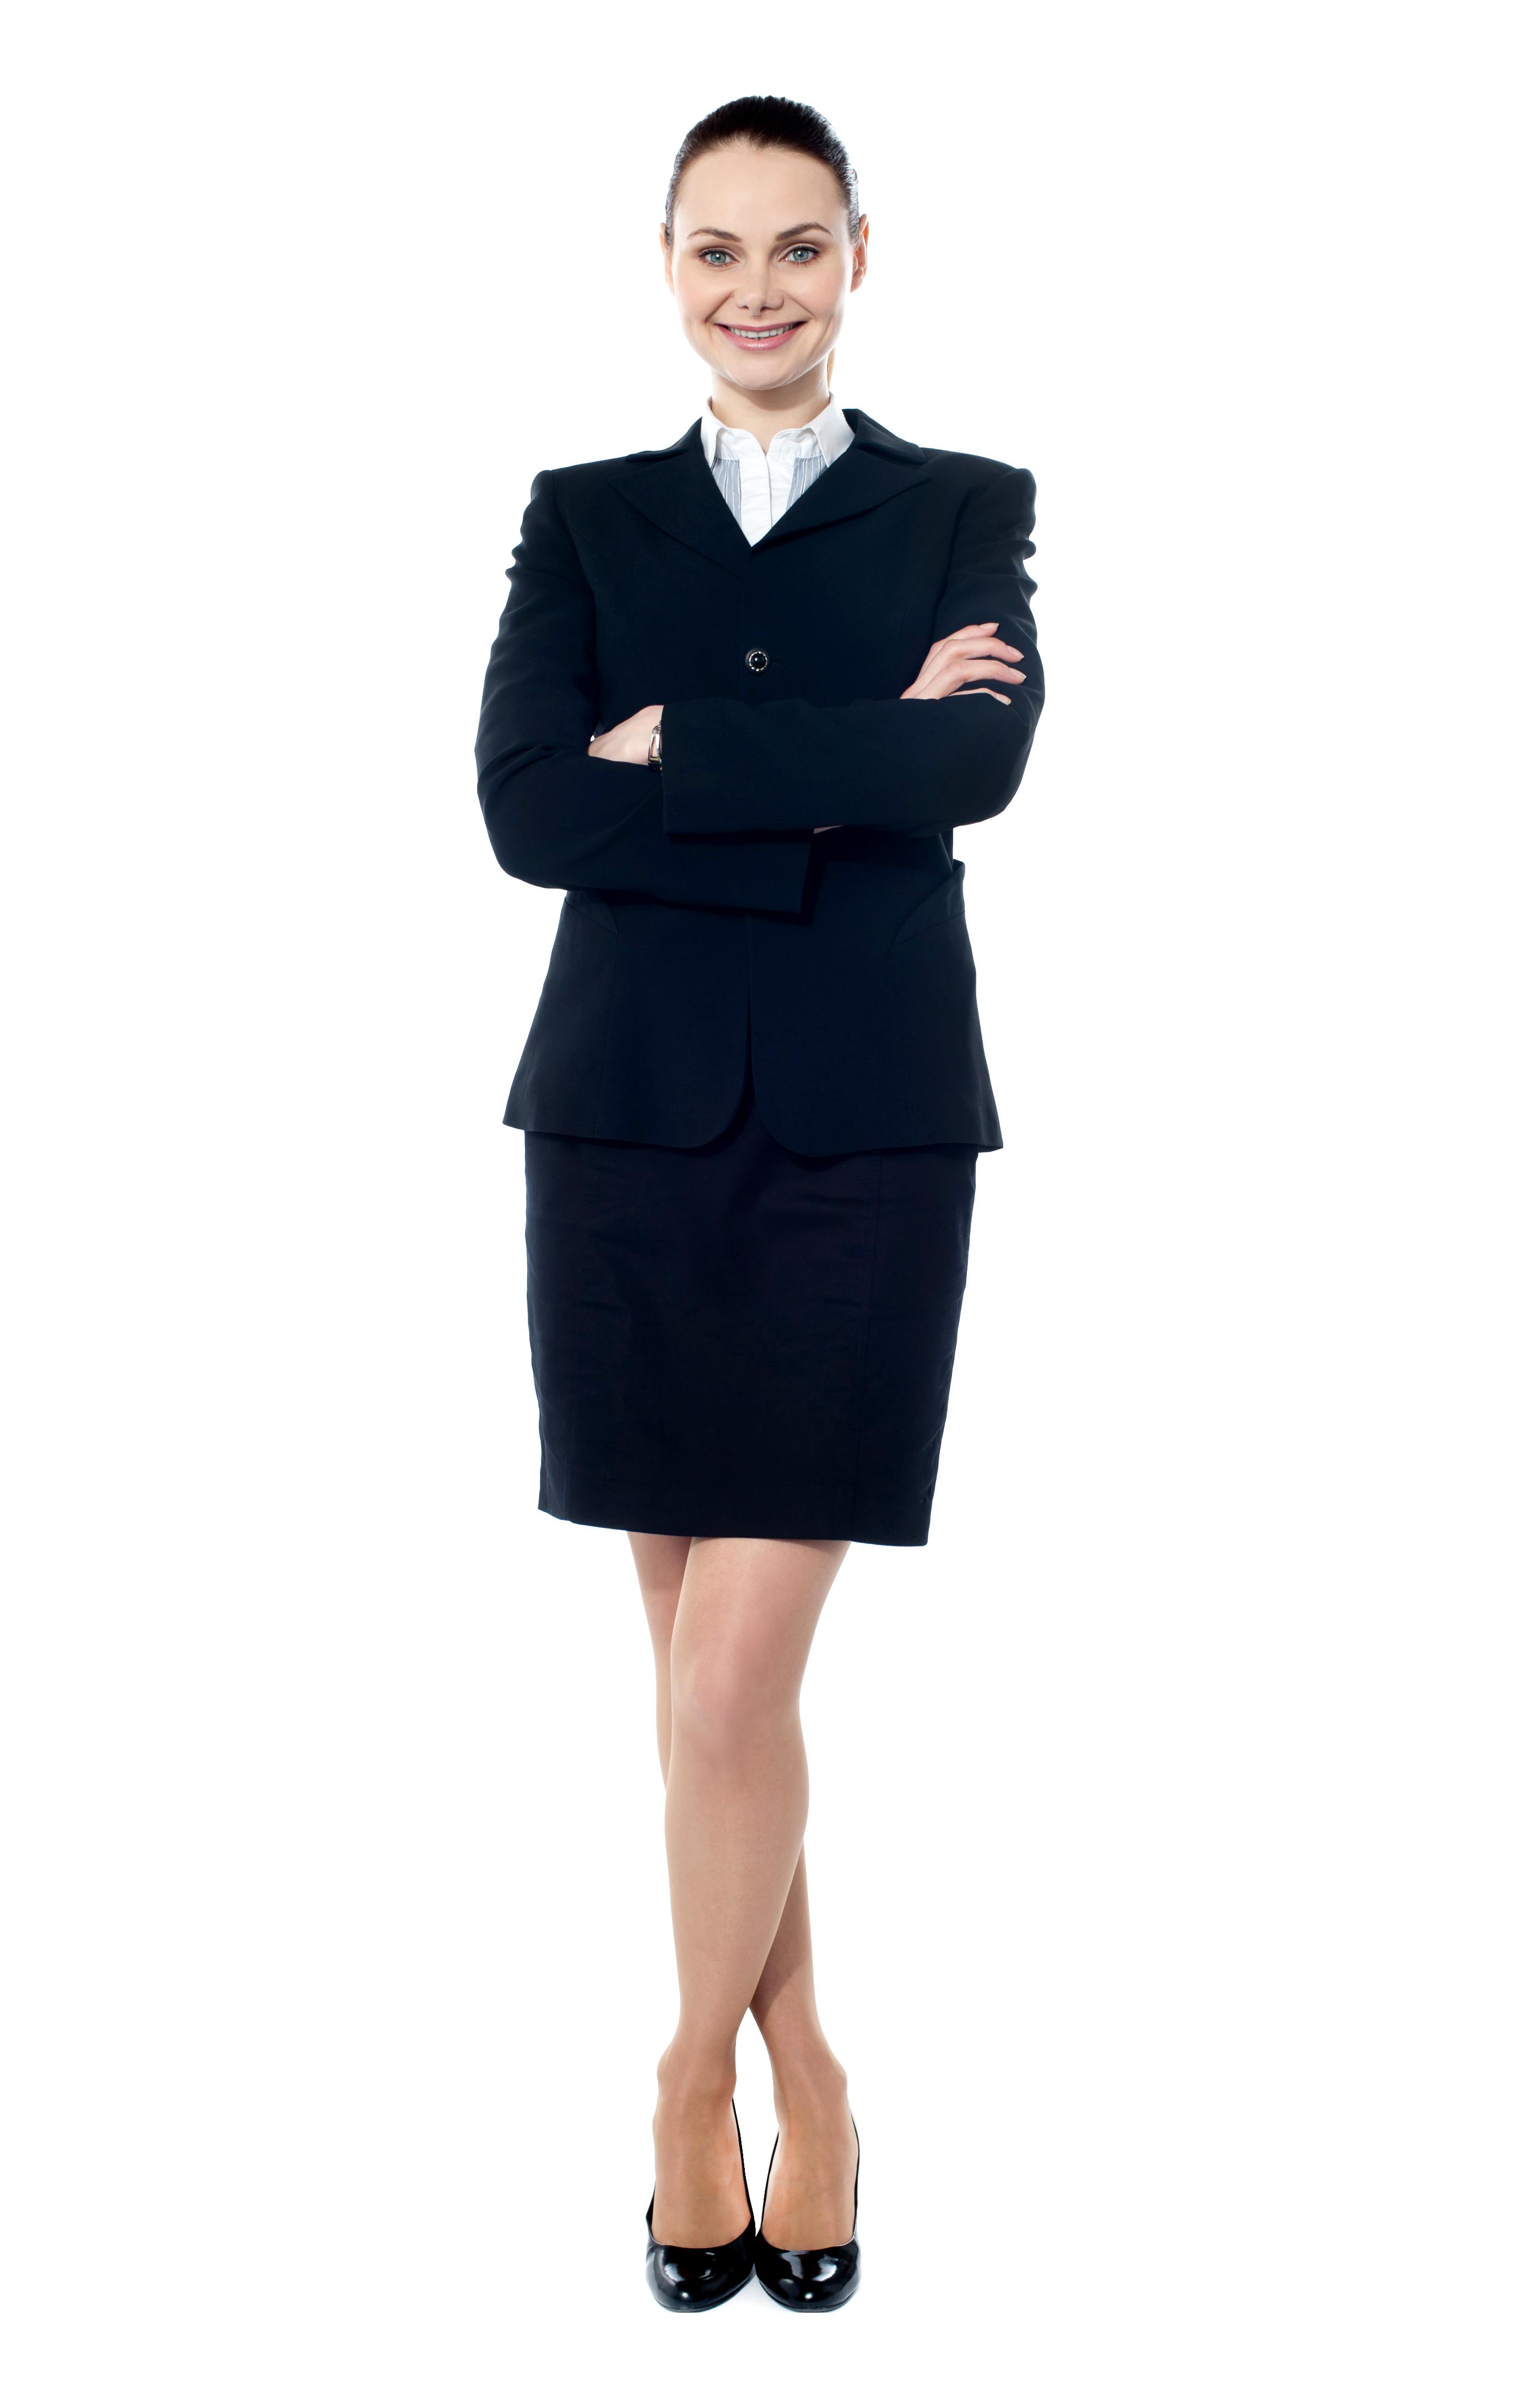 Business Women PNG Image - PurePNG | Free transparent CC0 ...